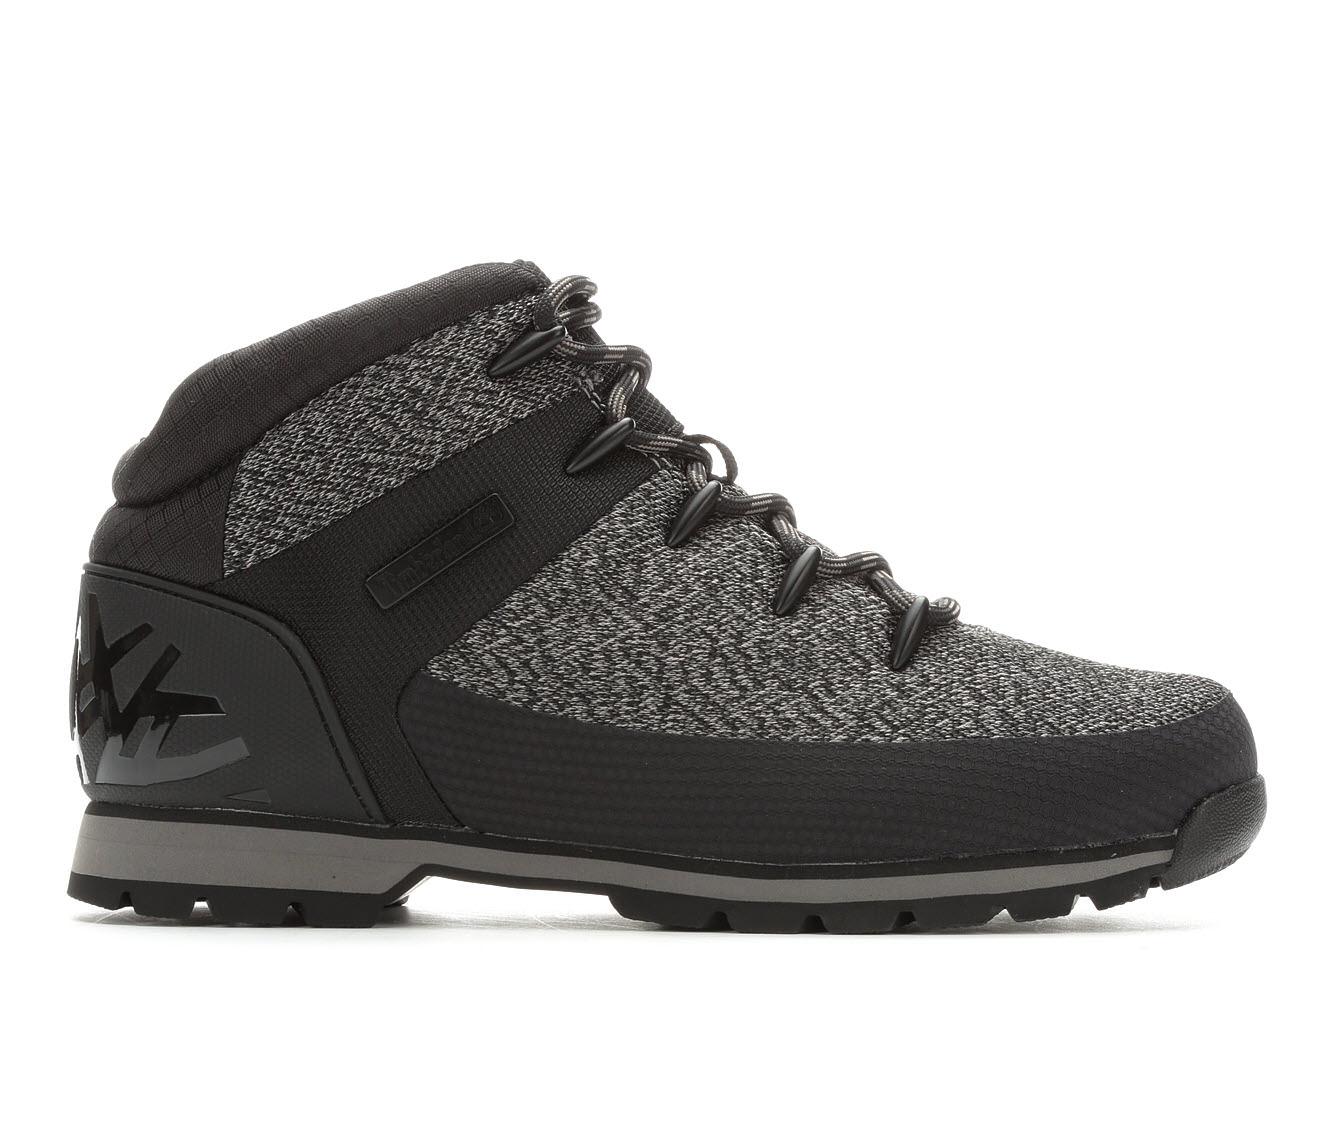 Timberland Euro Sprint Hiker Men's Boots (Black Canvas)